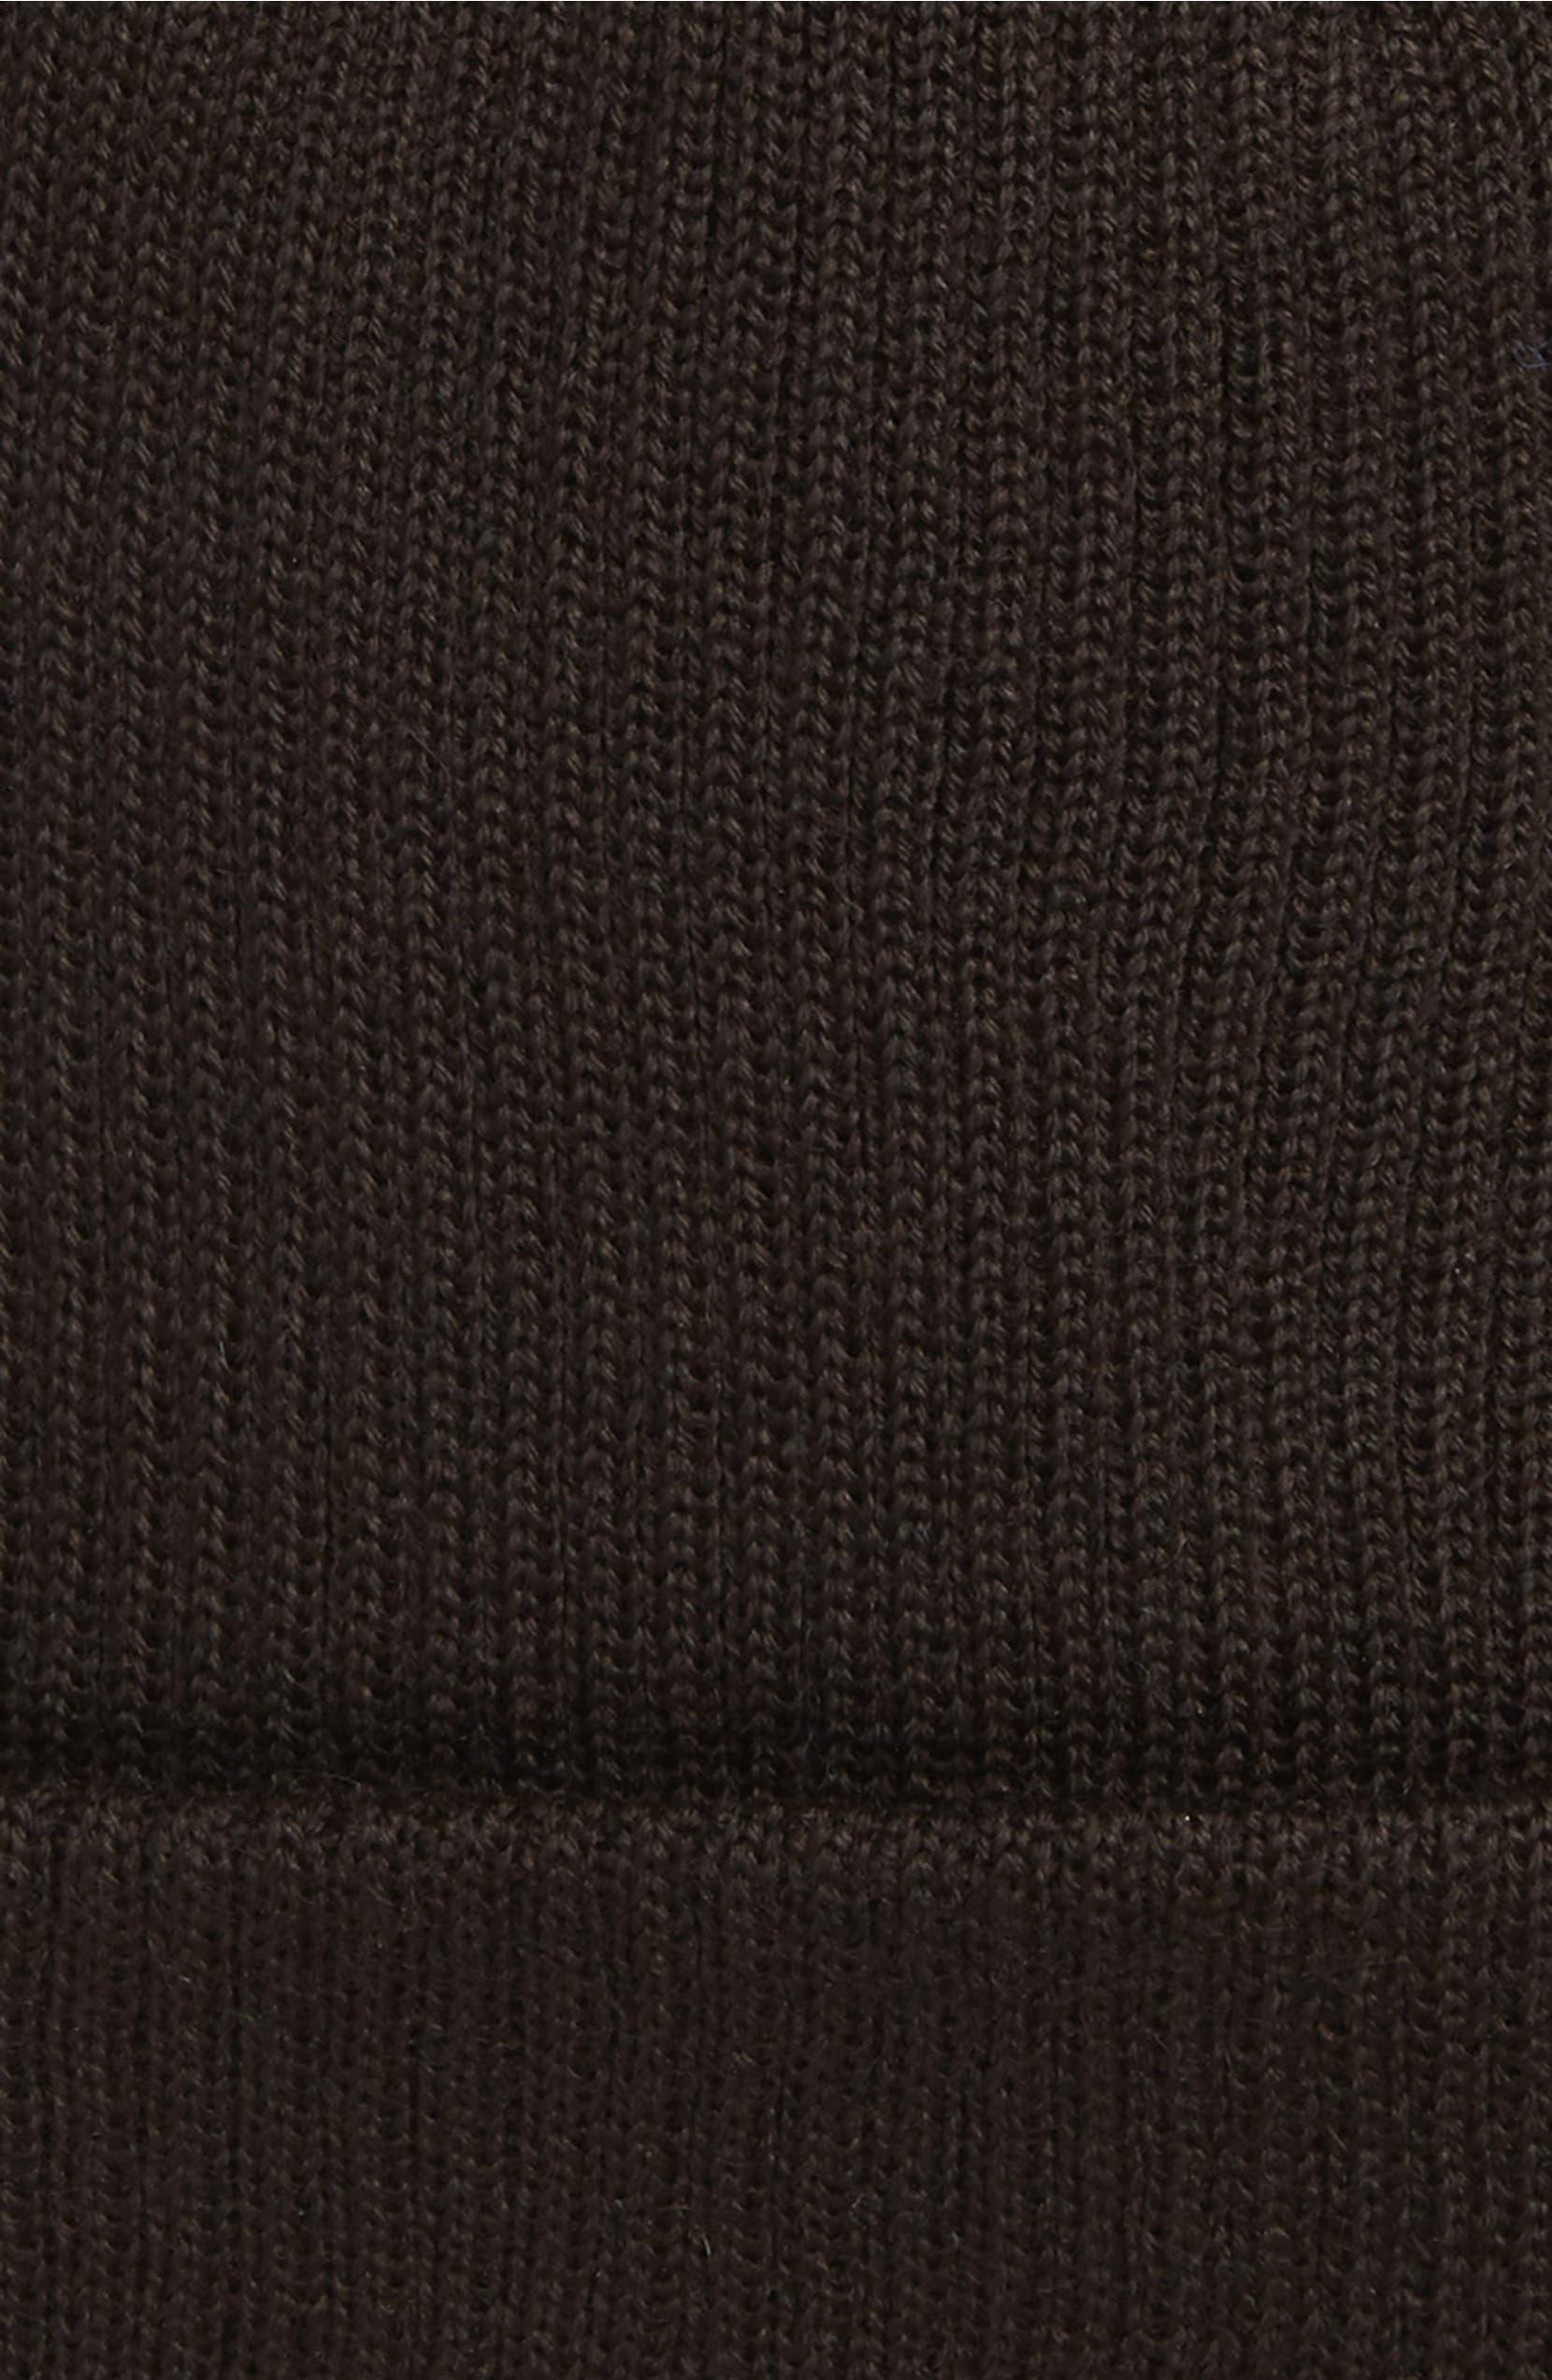 60895093b9f Nike NikeLab Essential Knit Beanie